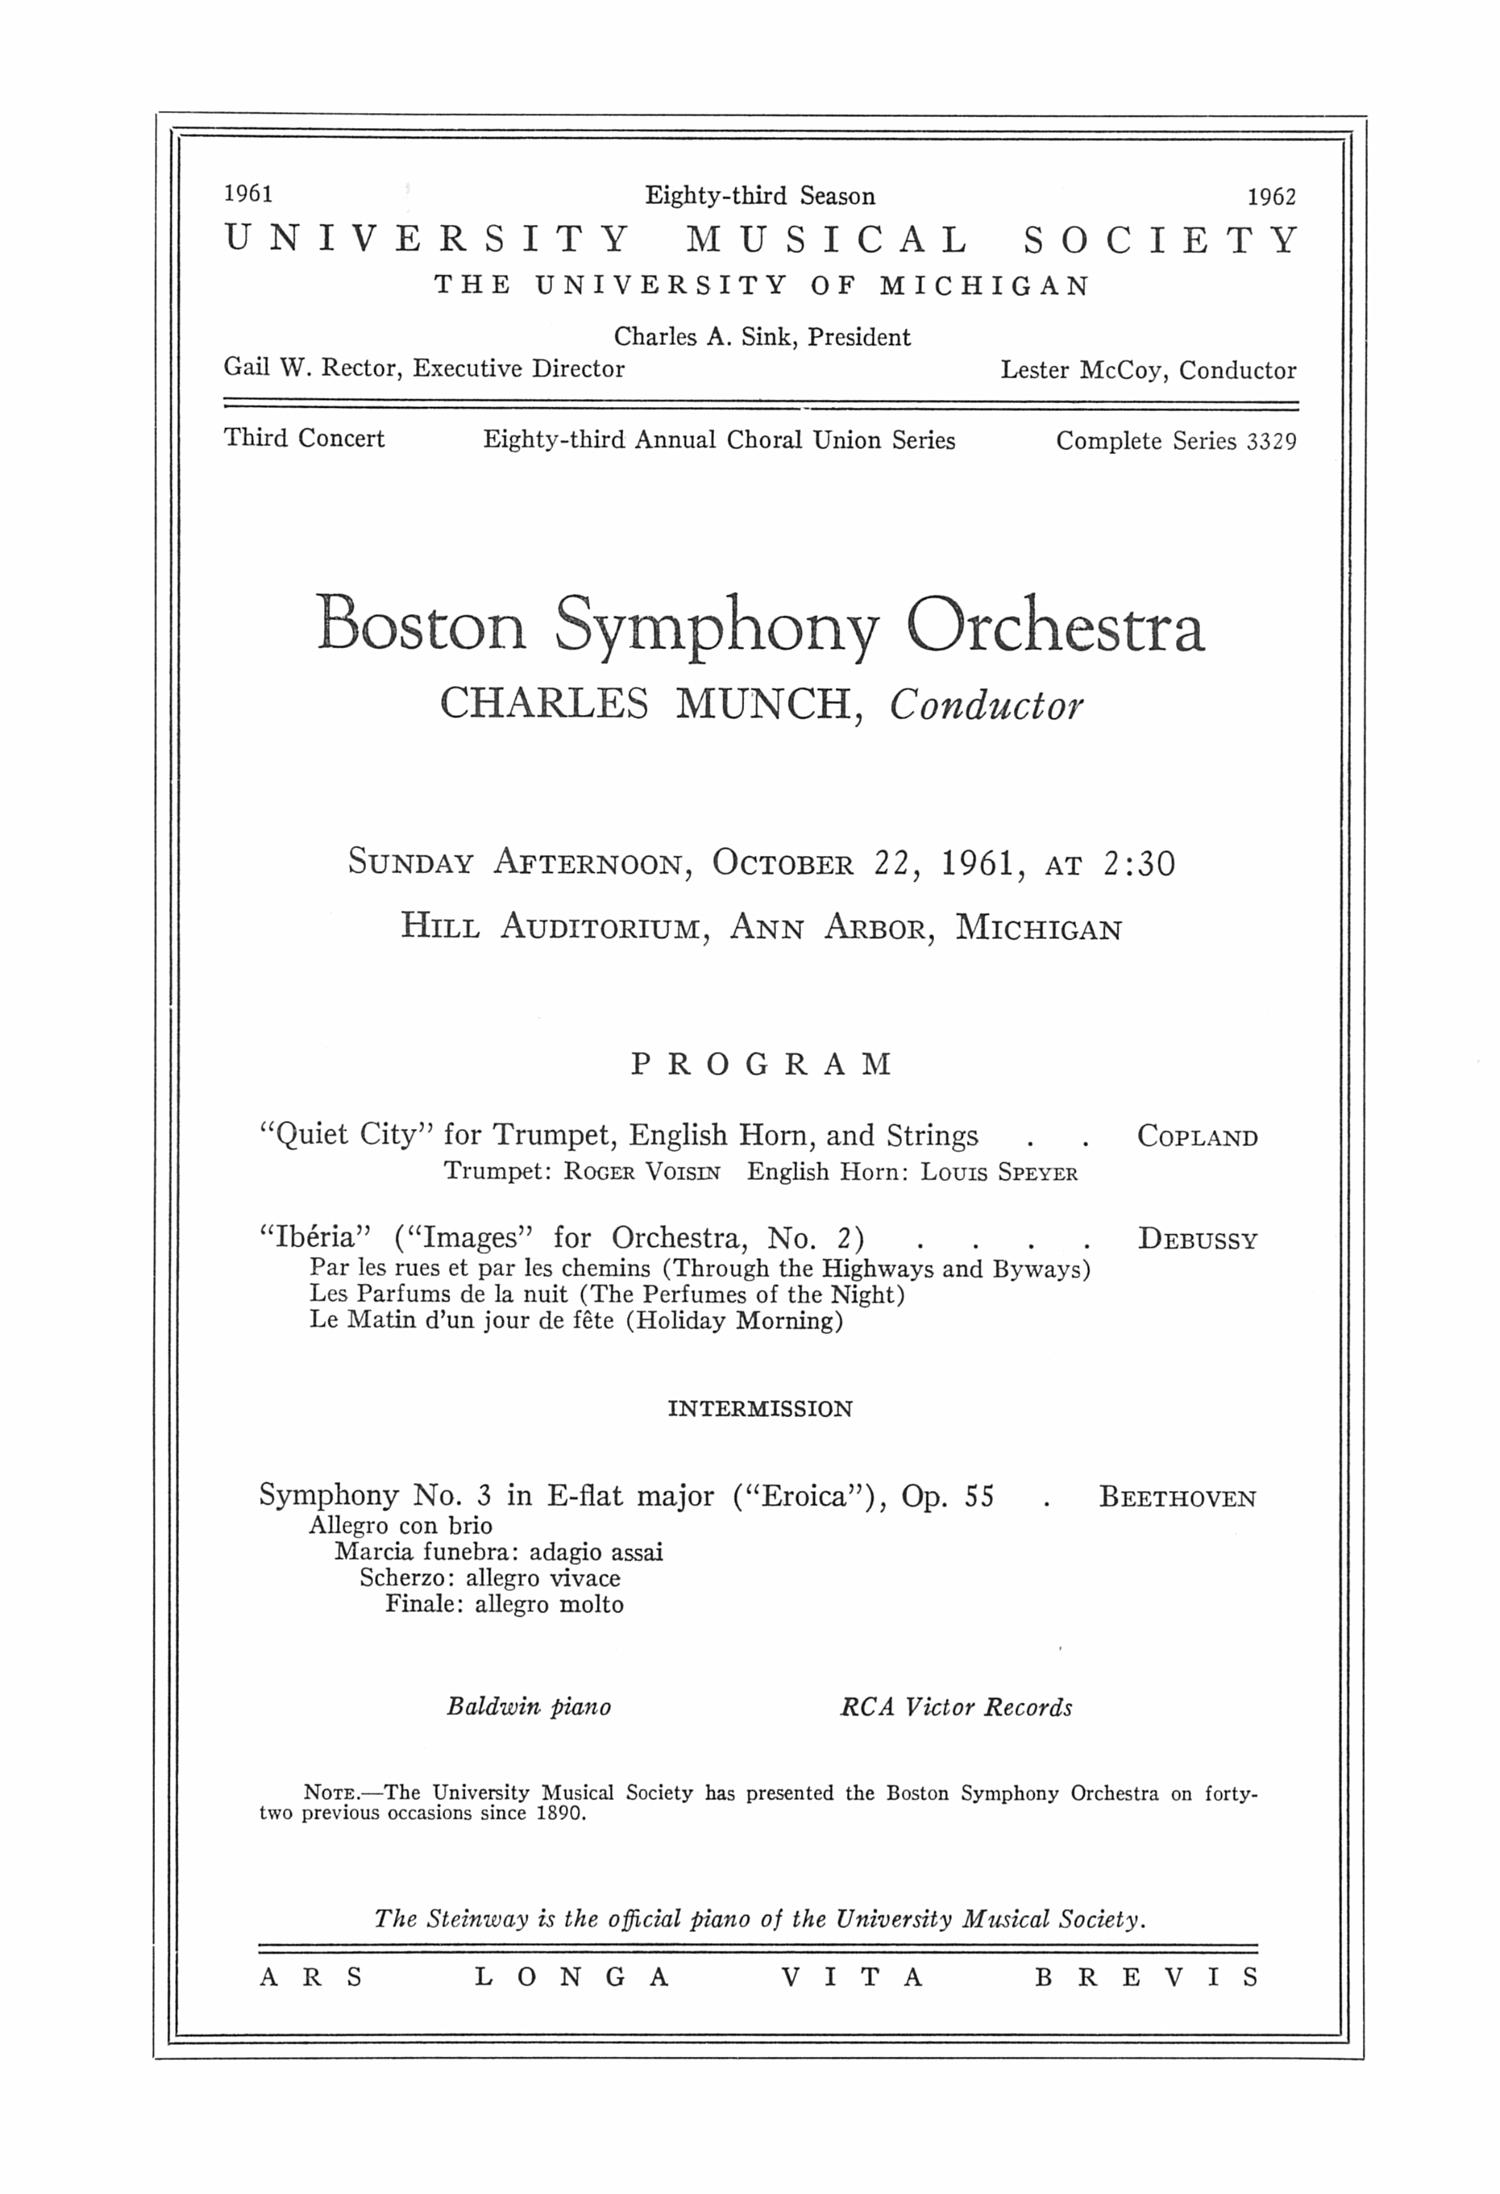 Ums Concert Program October 22 1961 Boston Symphony